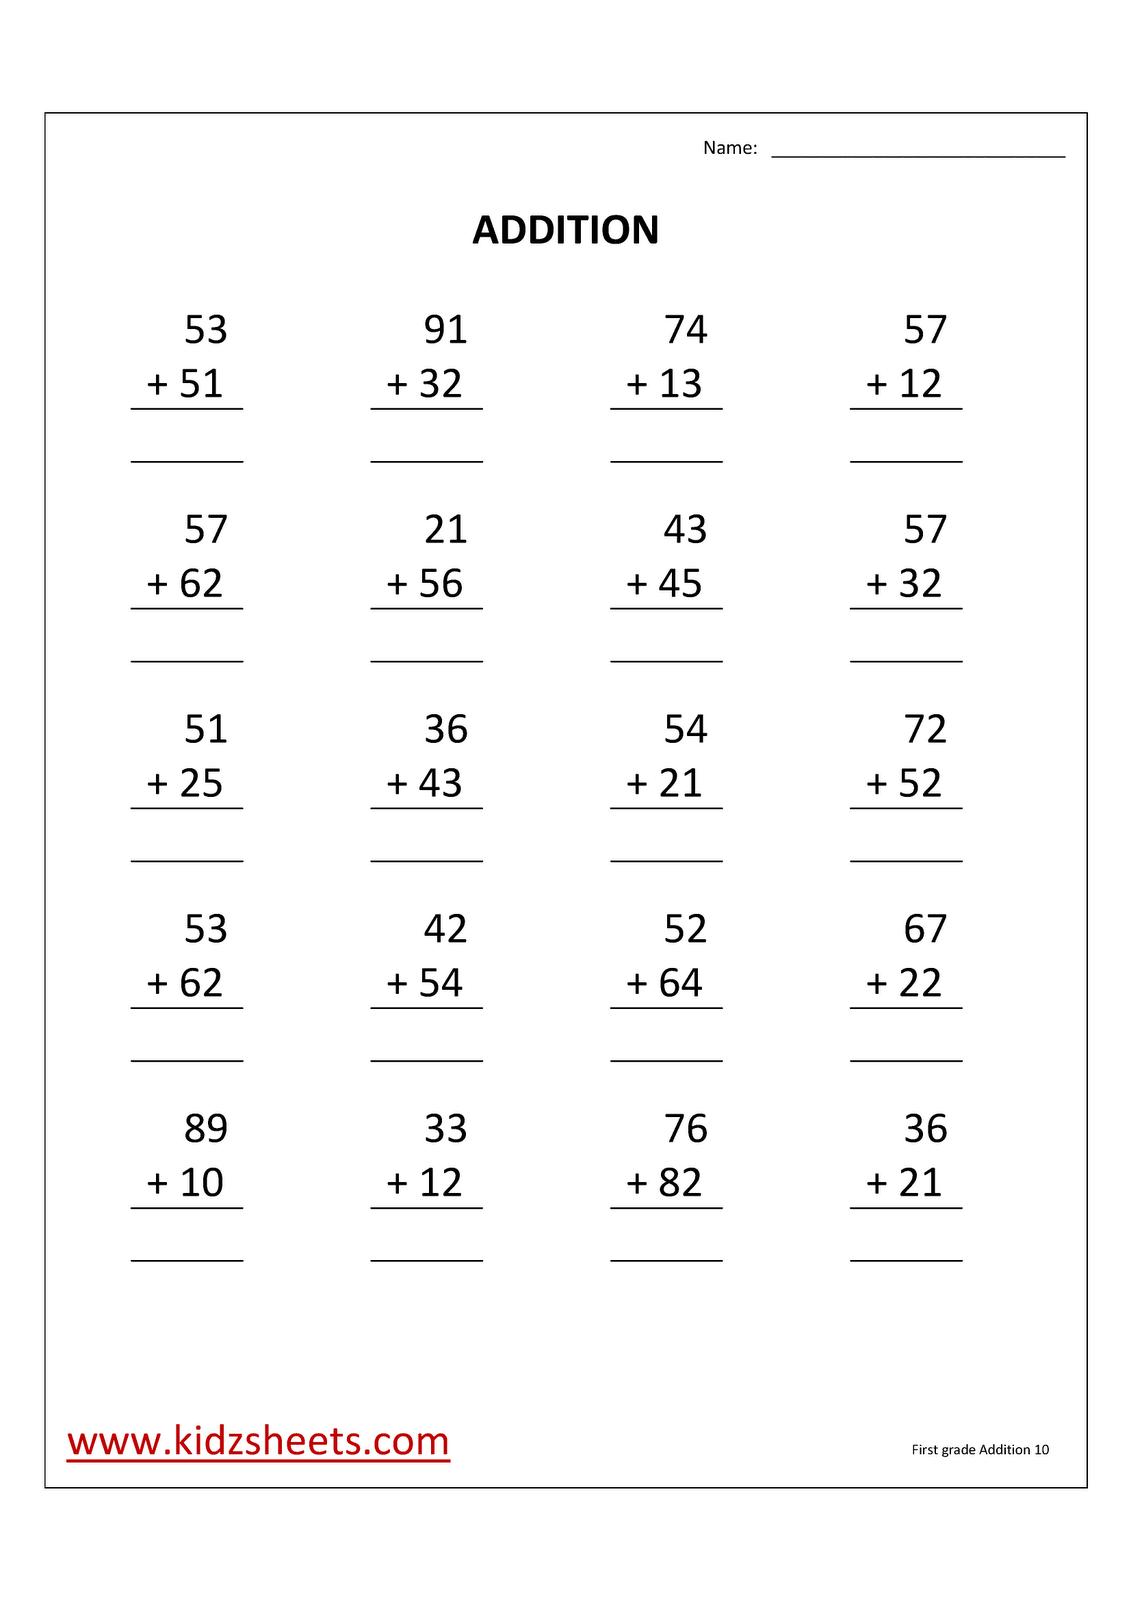 small resolution of Kidz Worksheets: First Grade Addition Worksheet10